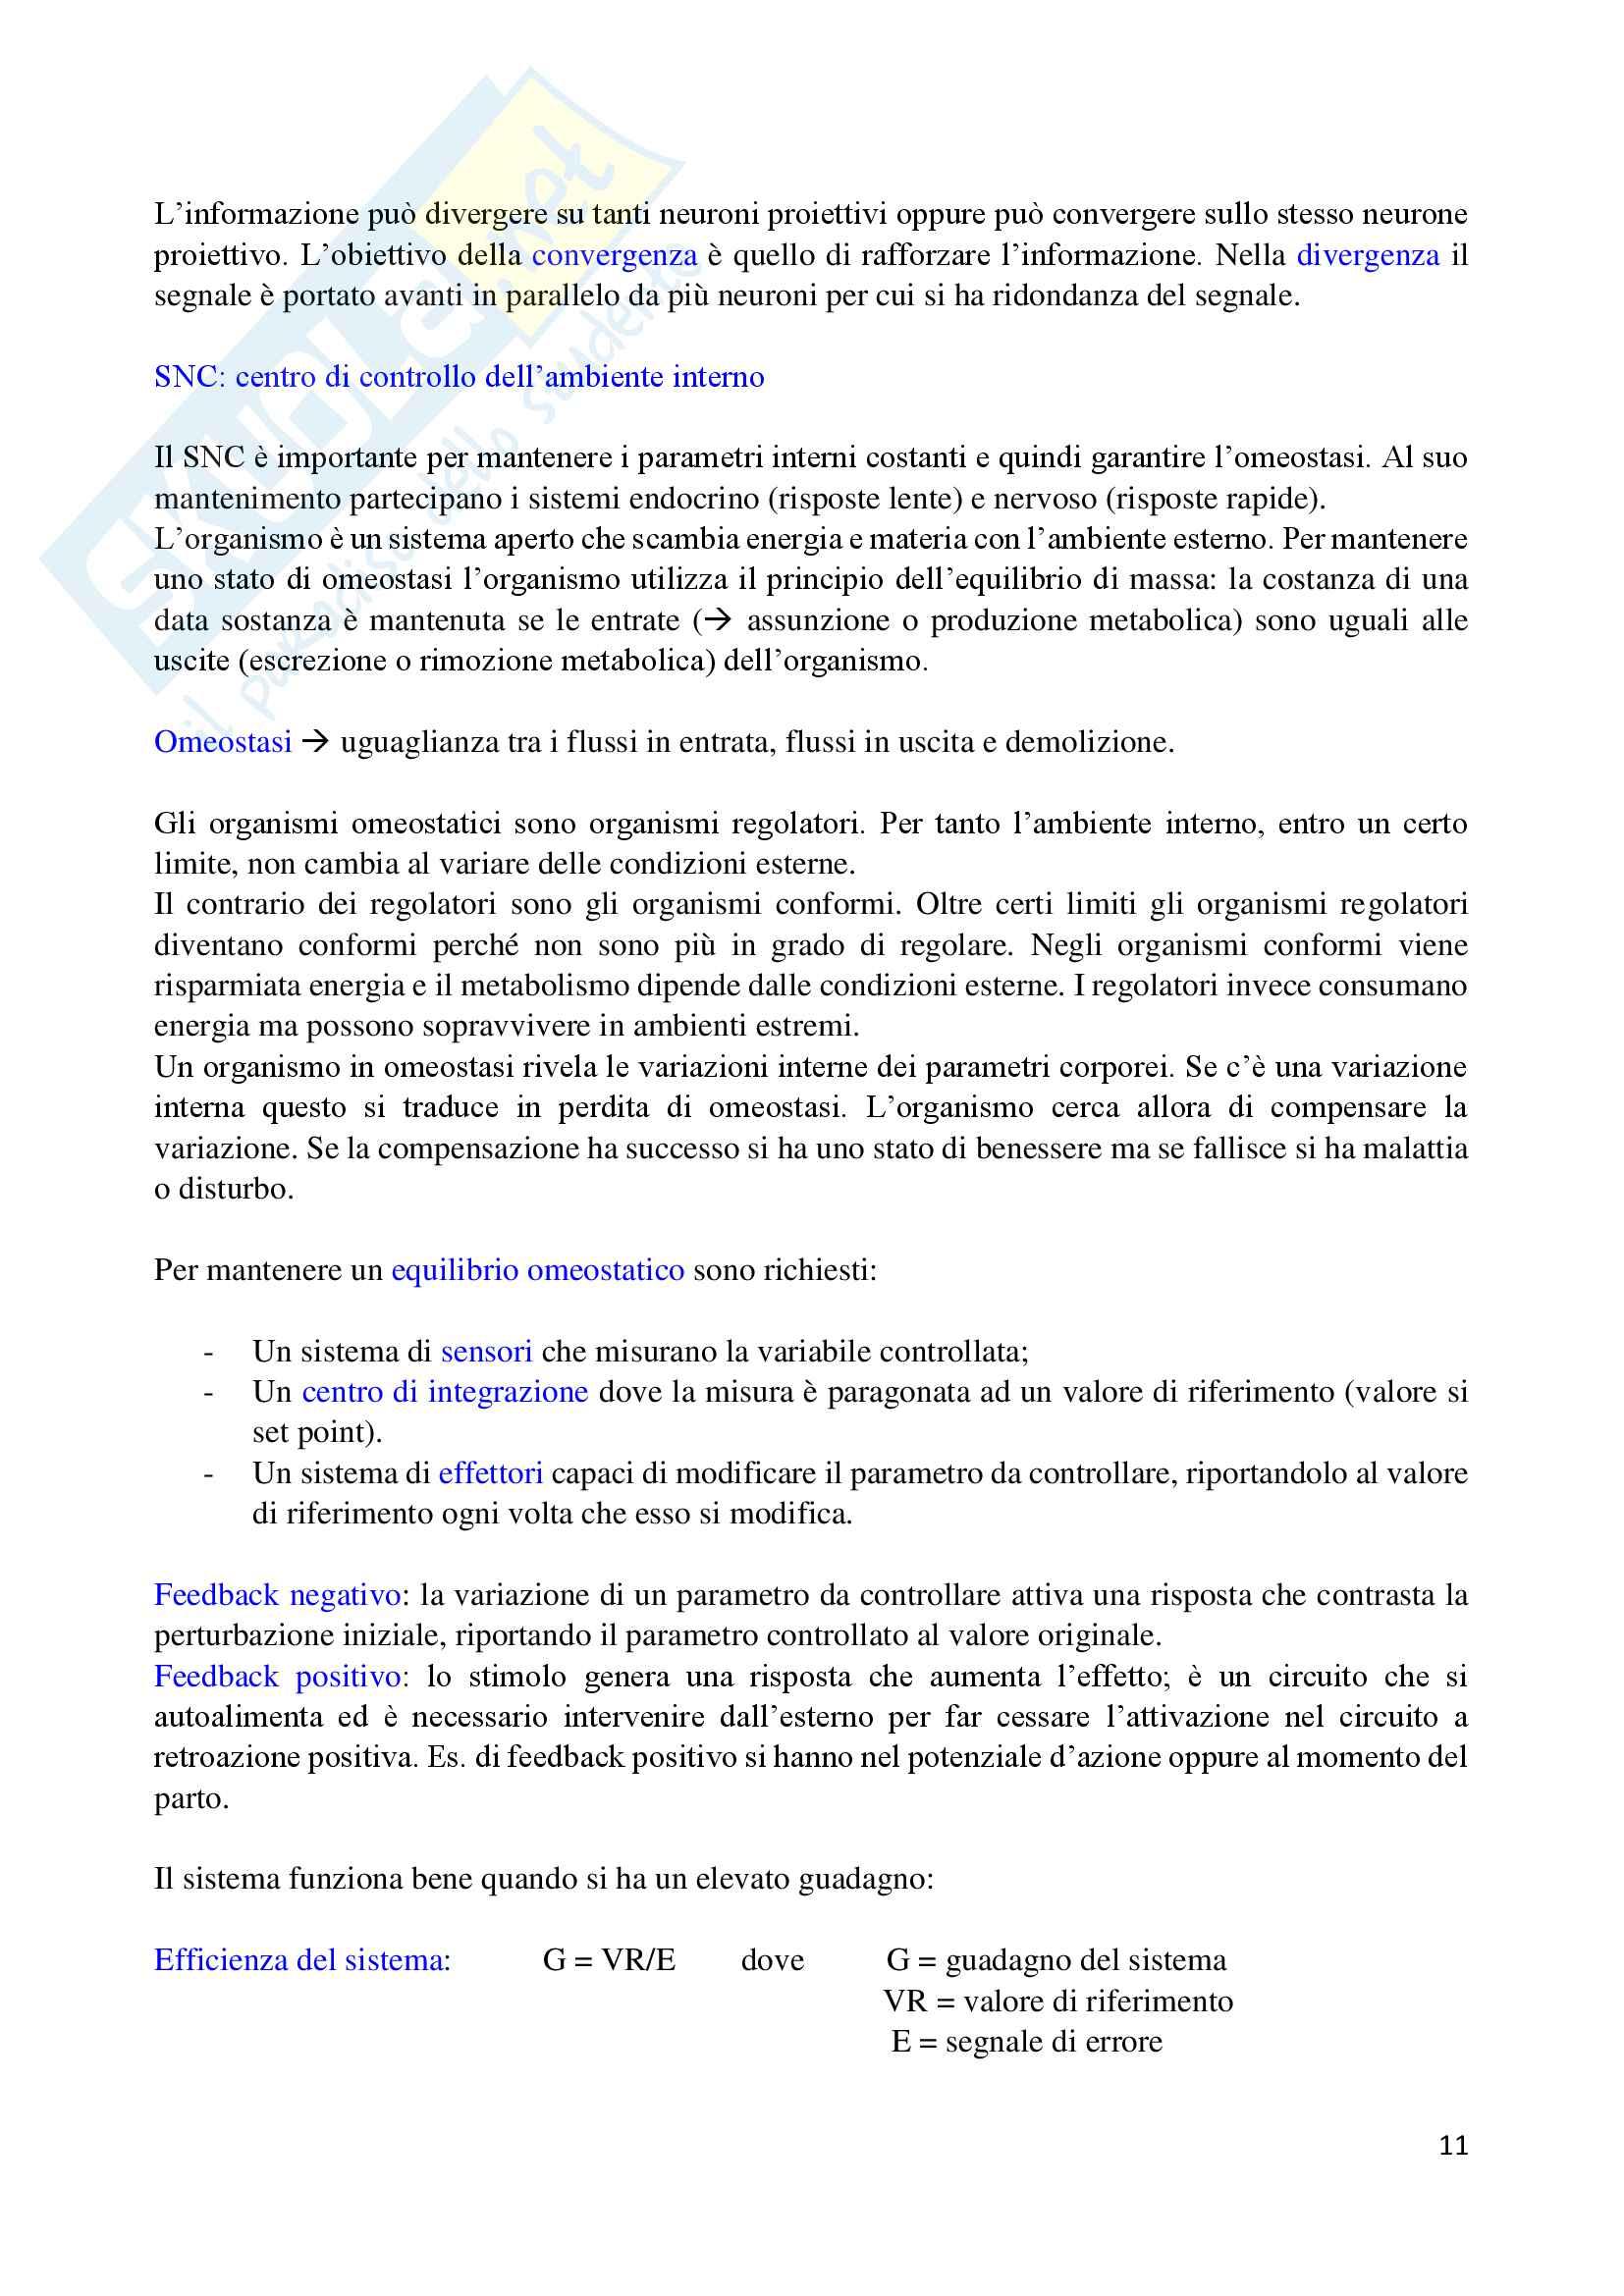 Fisiologia dei sistemi Pag. 11